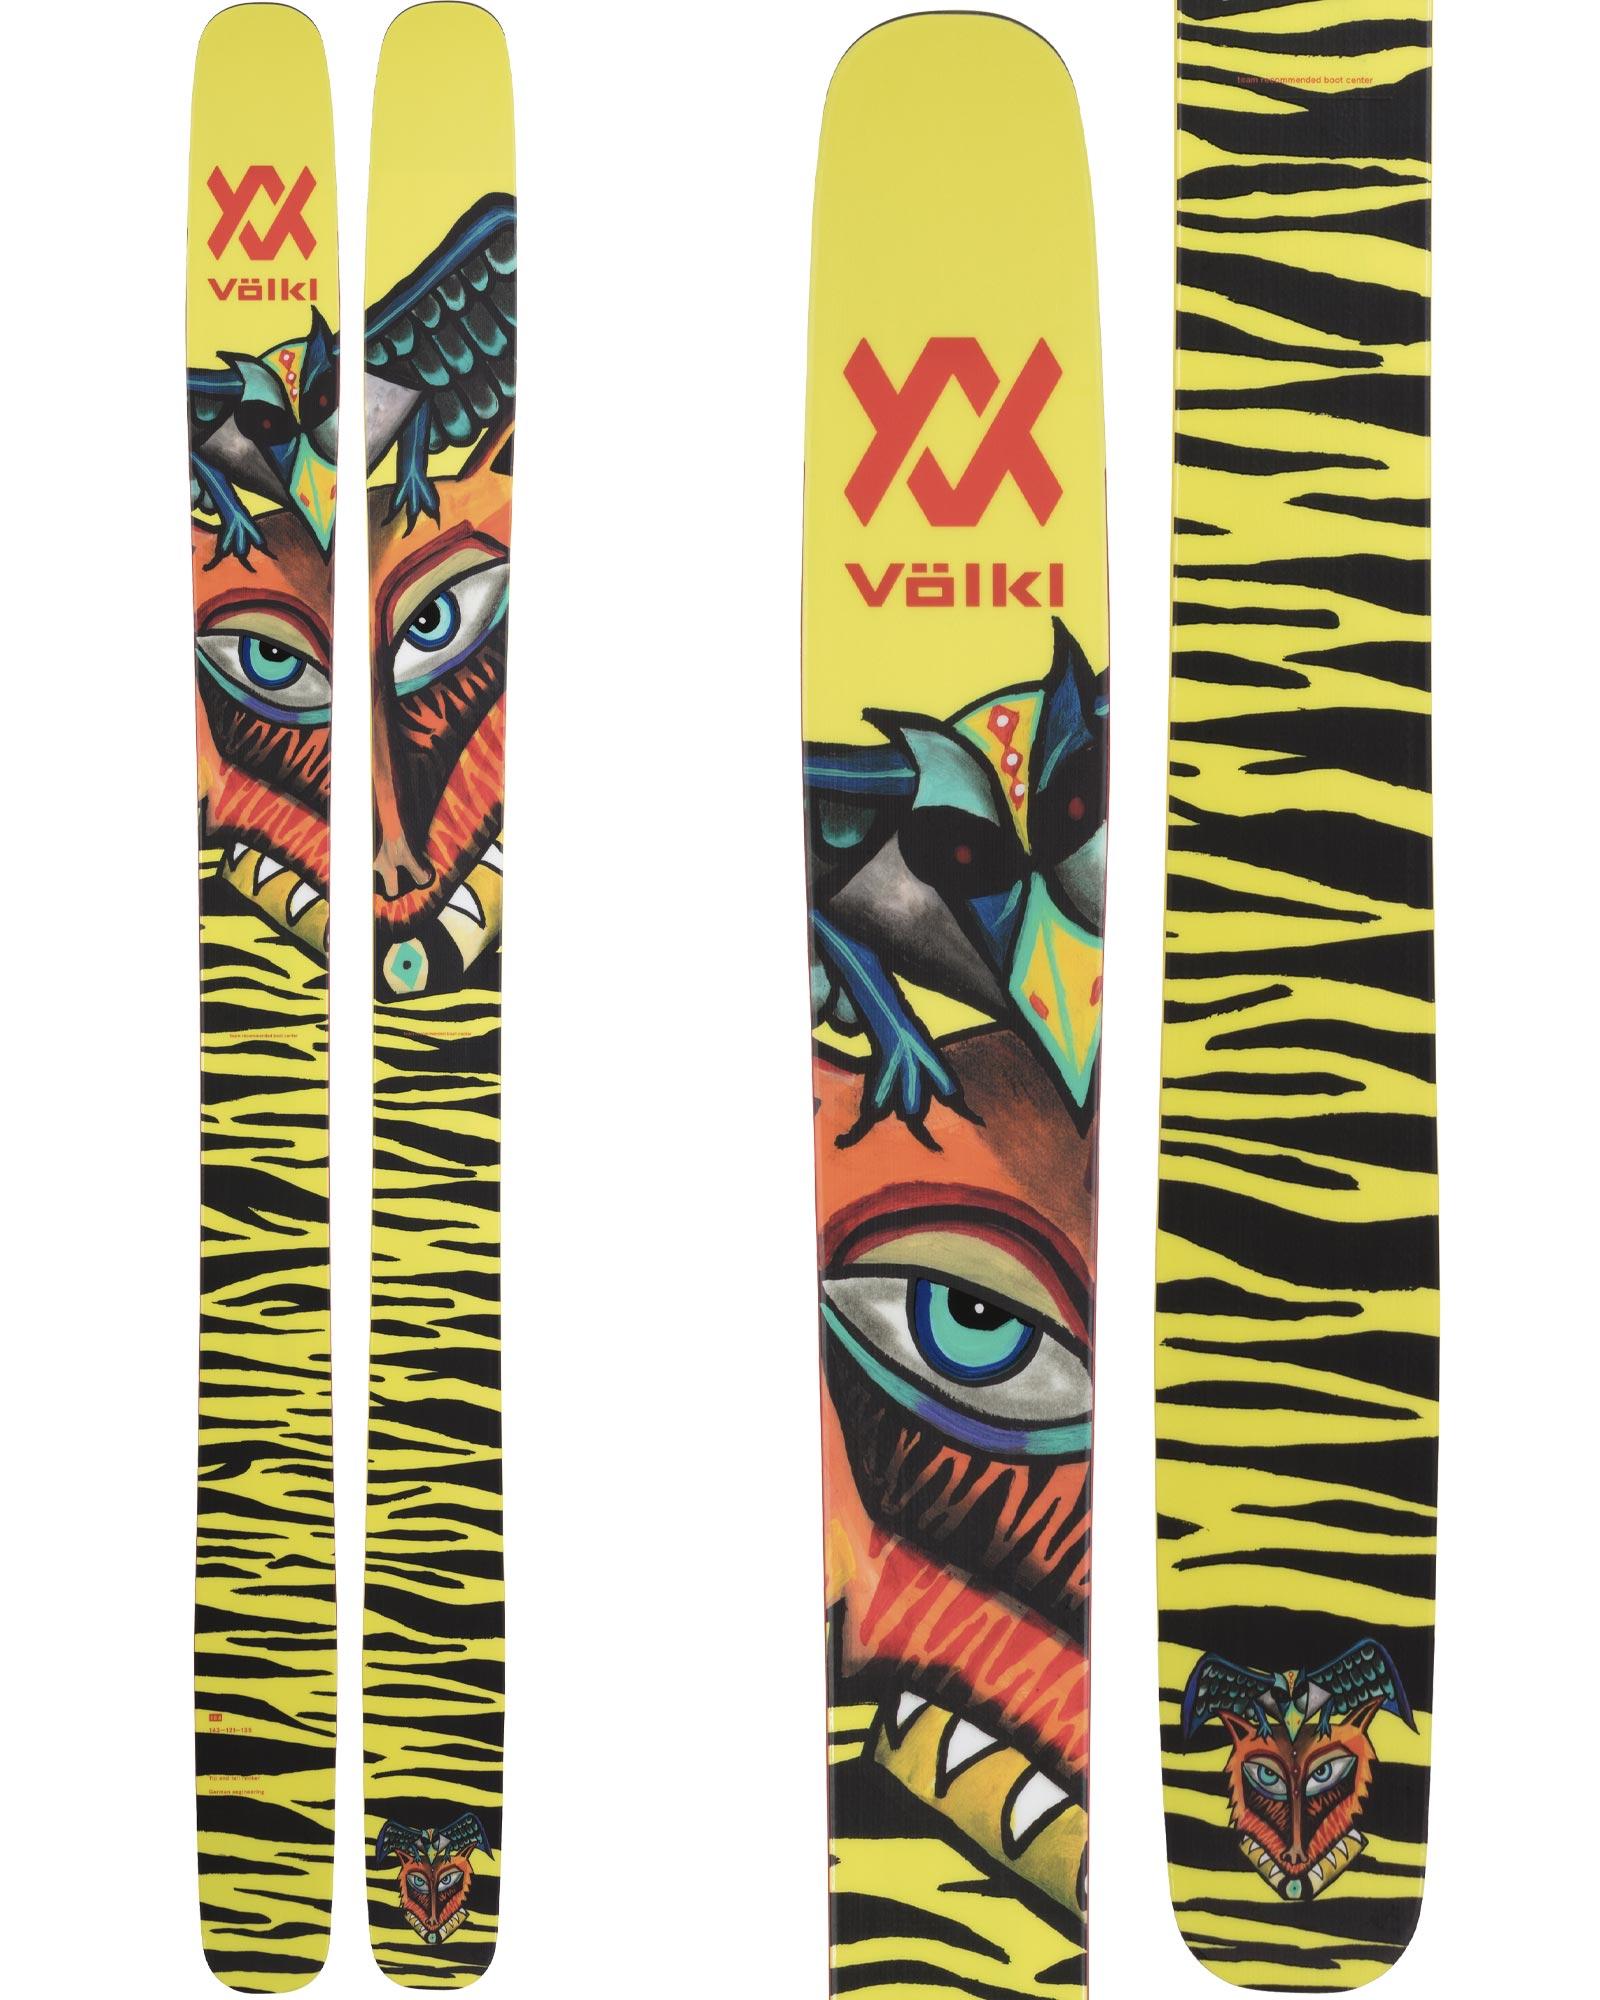 Volkl Men's Revolt 121 Freestyle Skis 2020 / 2021 0